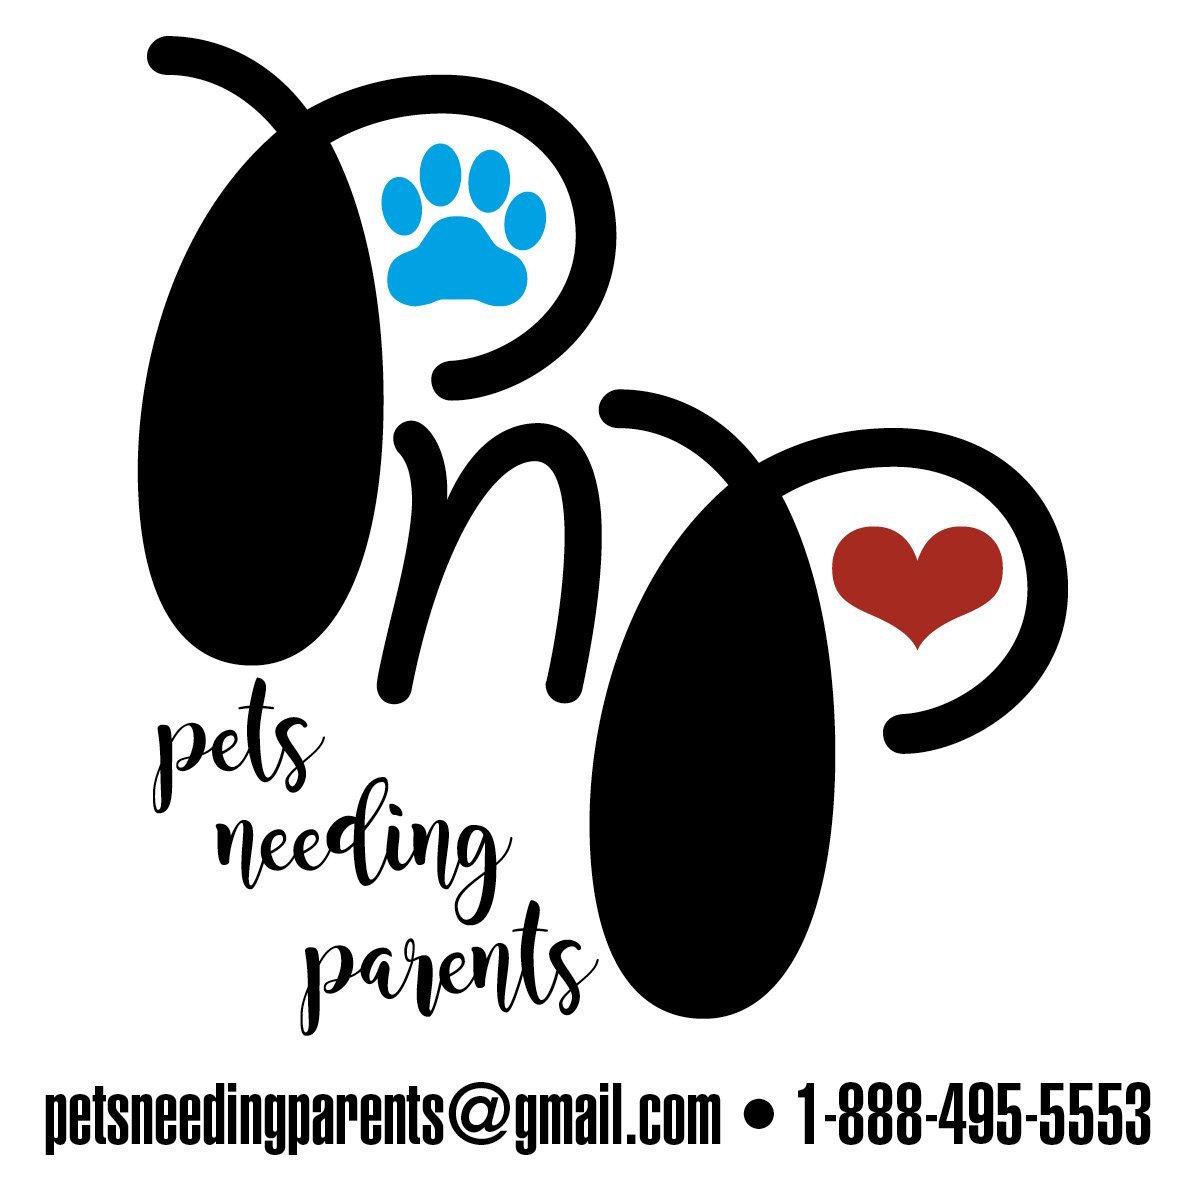 Pets Needing Parents